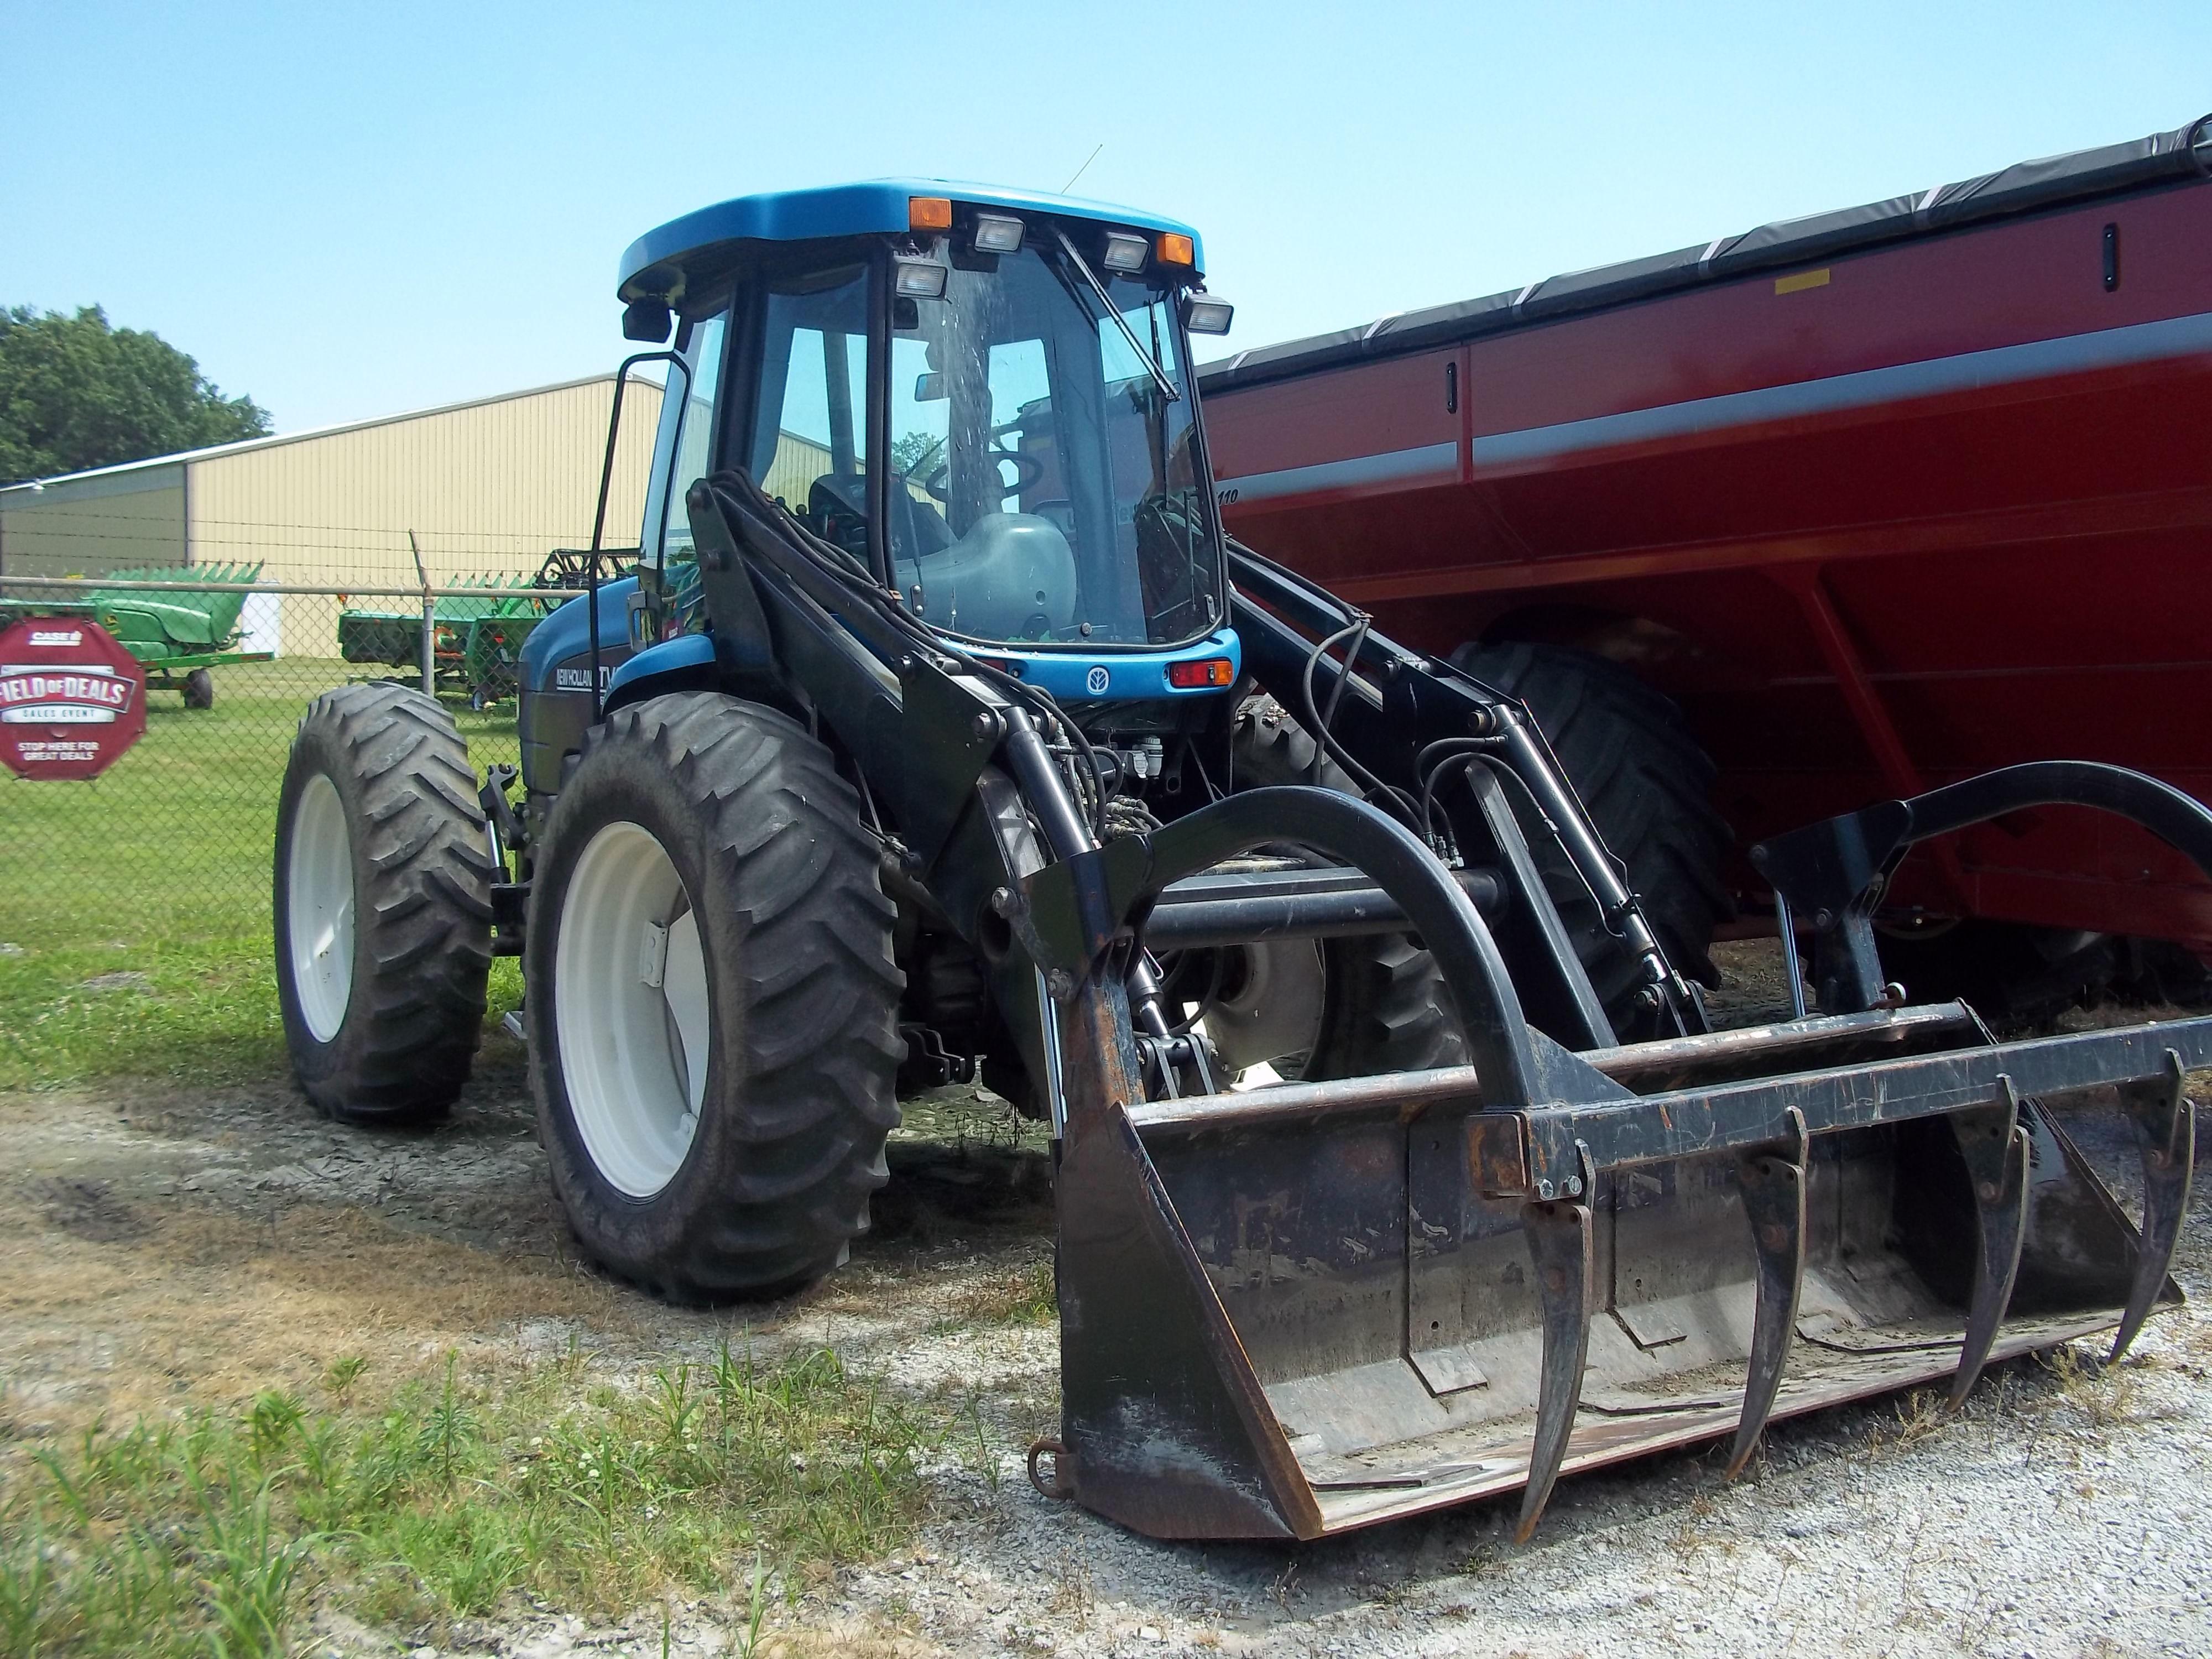 New Holland Tv6070 New Holland Tractor New Holland Agriculture